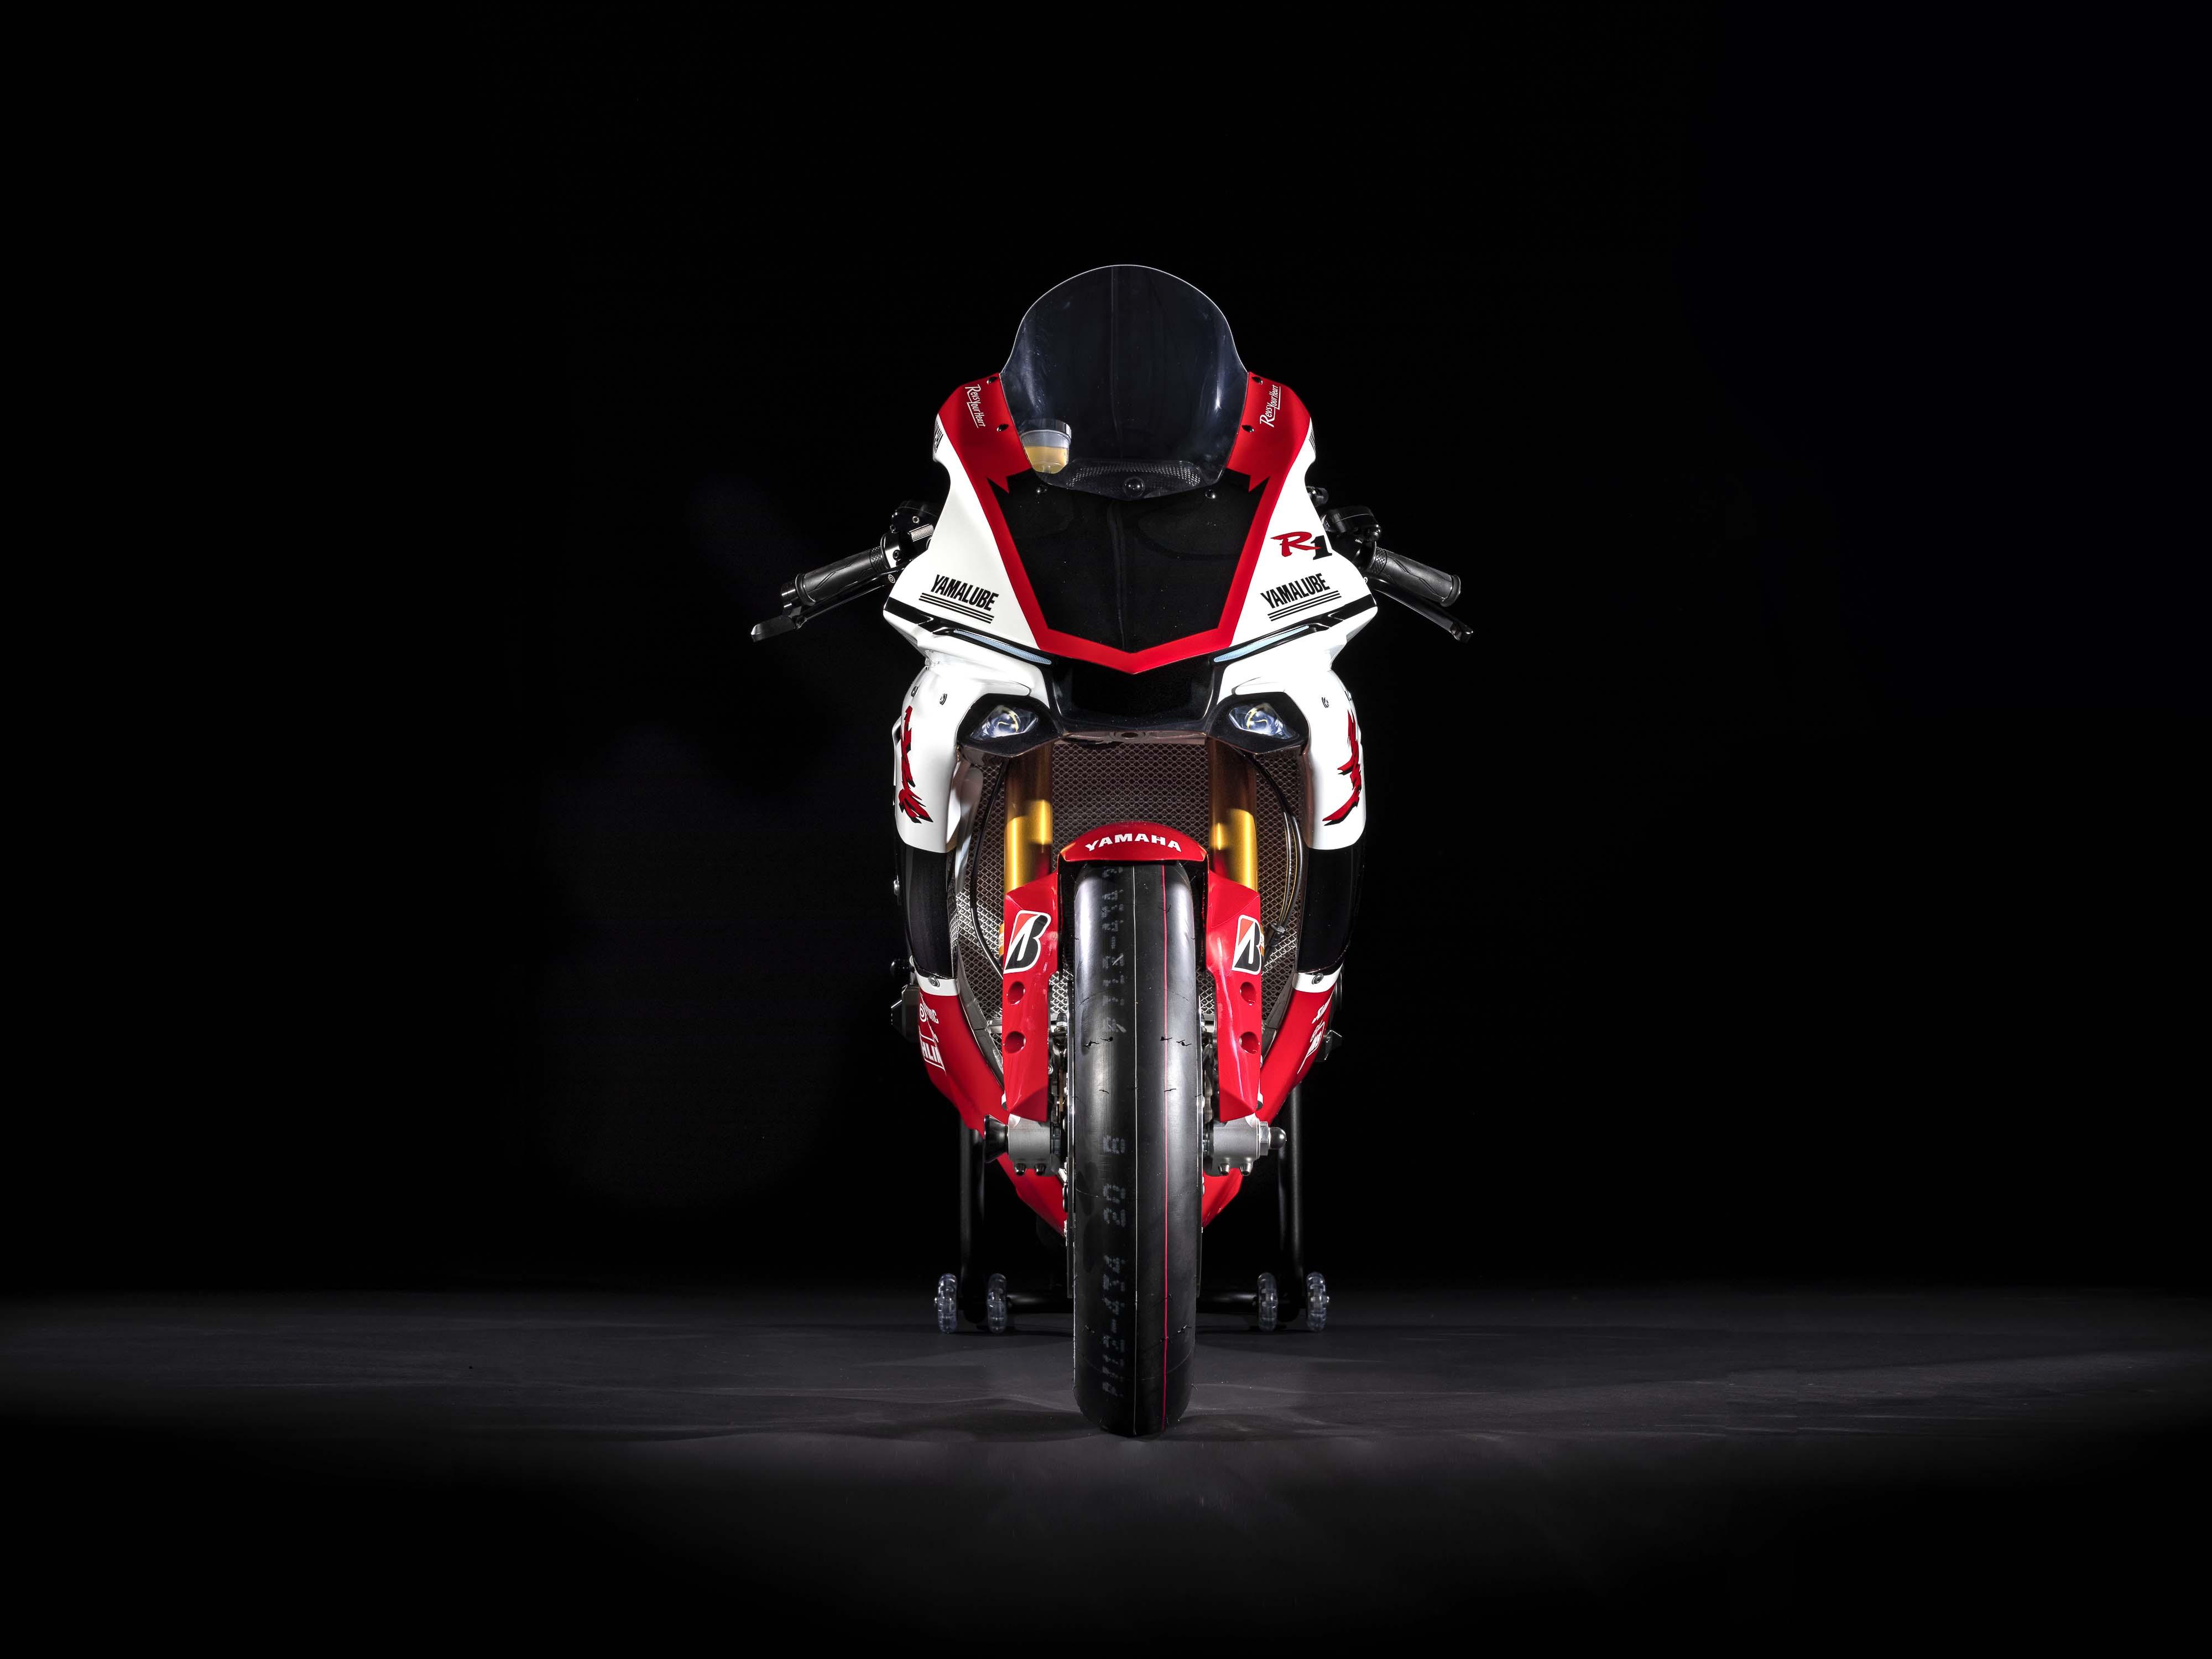 The Yamaha YZF-R1 GYTR Superbike Celebrates 20 Years of the